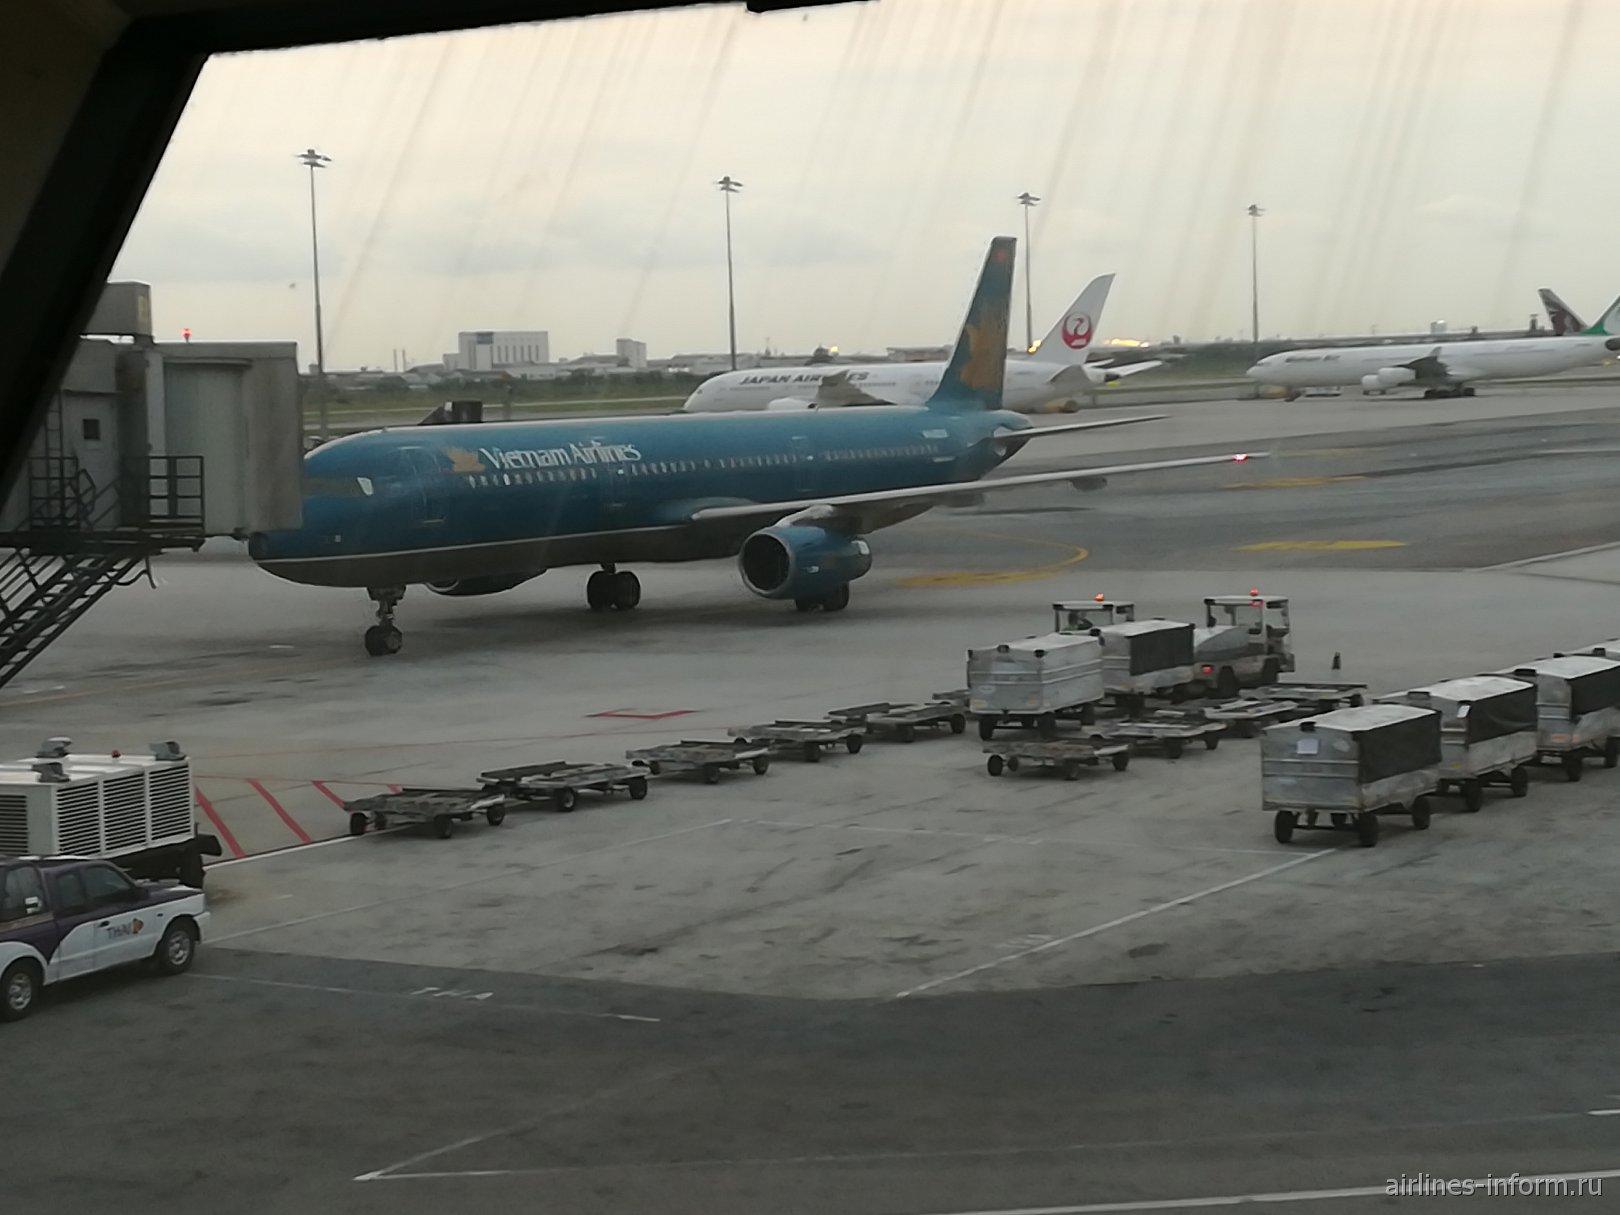 В гости к вьетнамцам. Часть 2. Bangkok (Suvarnabhumi, BKK) -  Hanoi (Noibai, HAN) с Vietnam Airlines на А-321